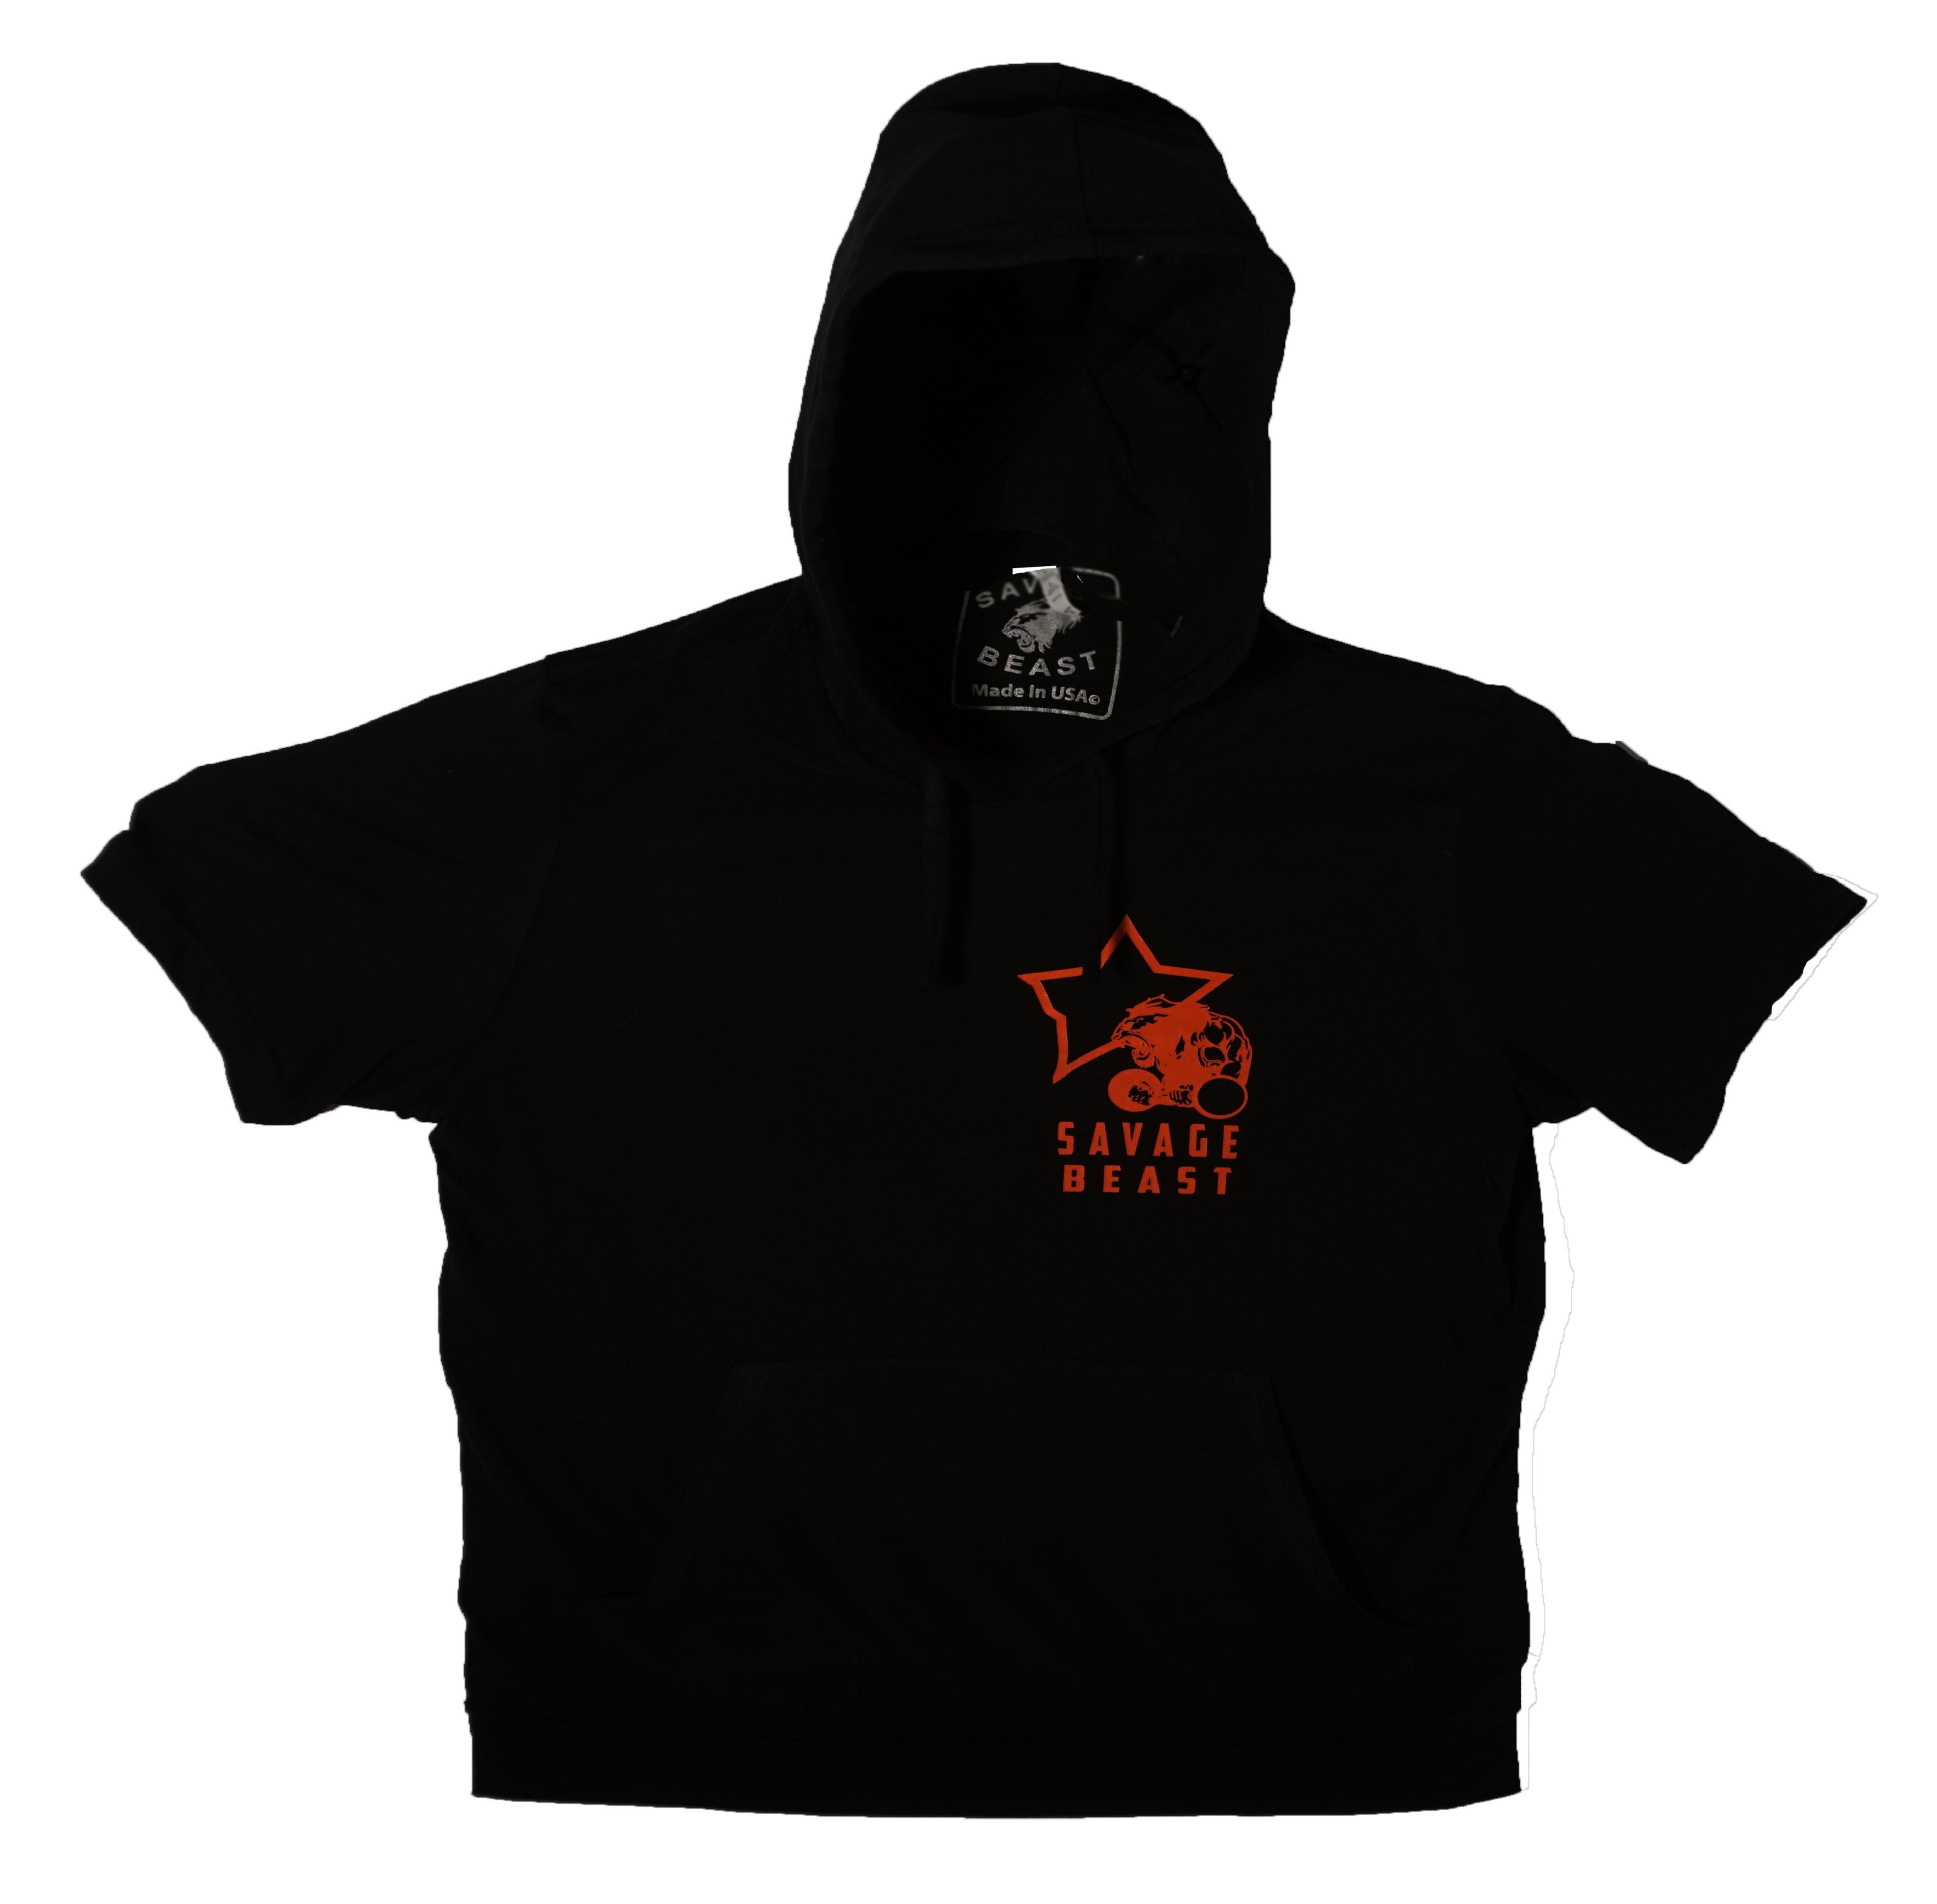 Black t shirt hoodie - Tshirt Hoodie Black